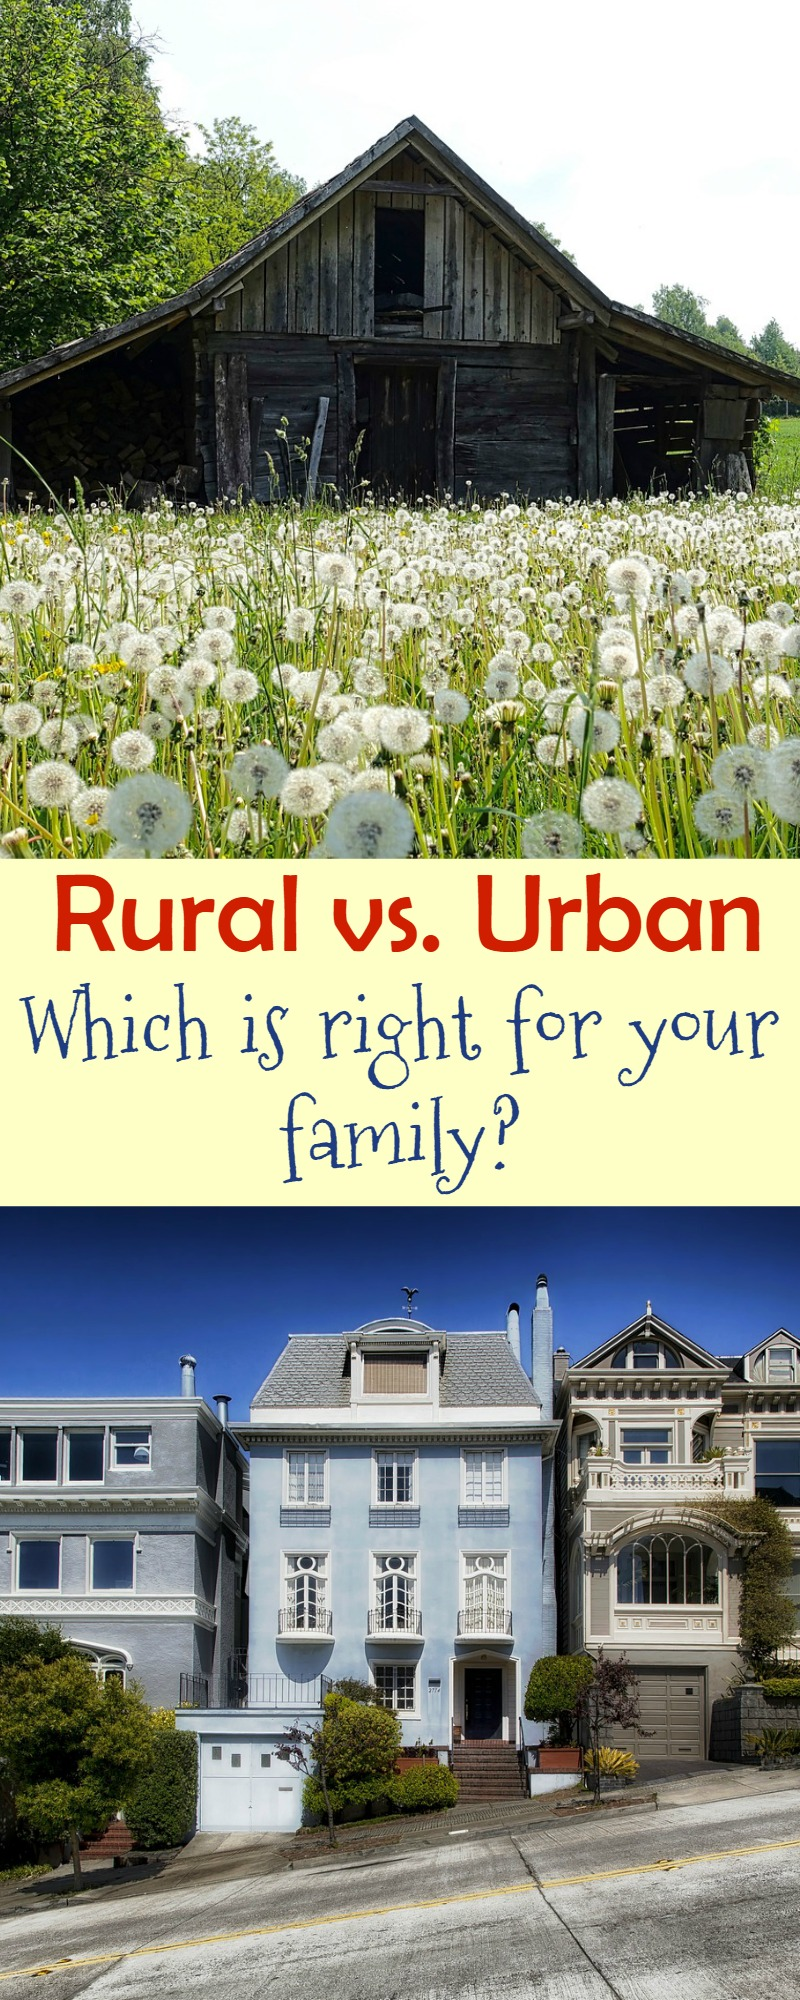 Urban vs rural education